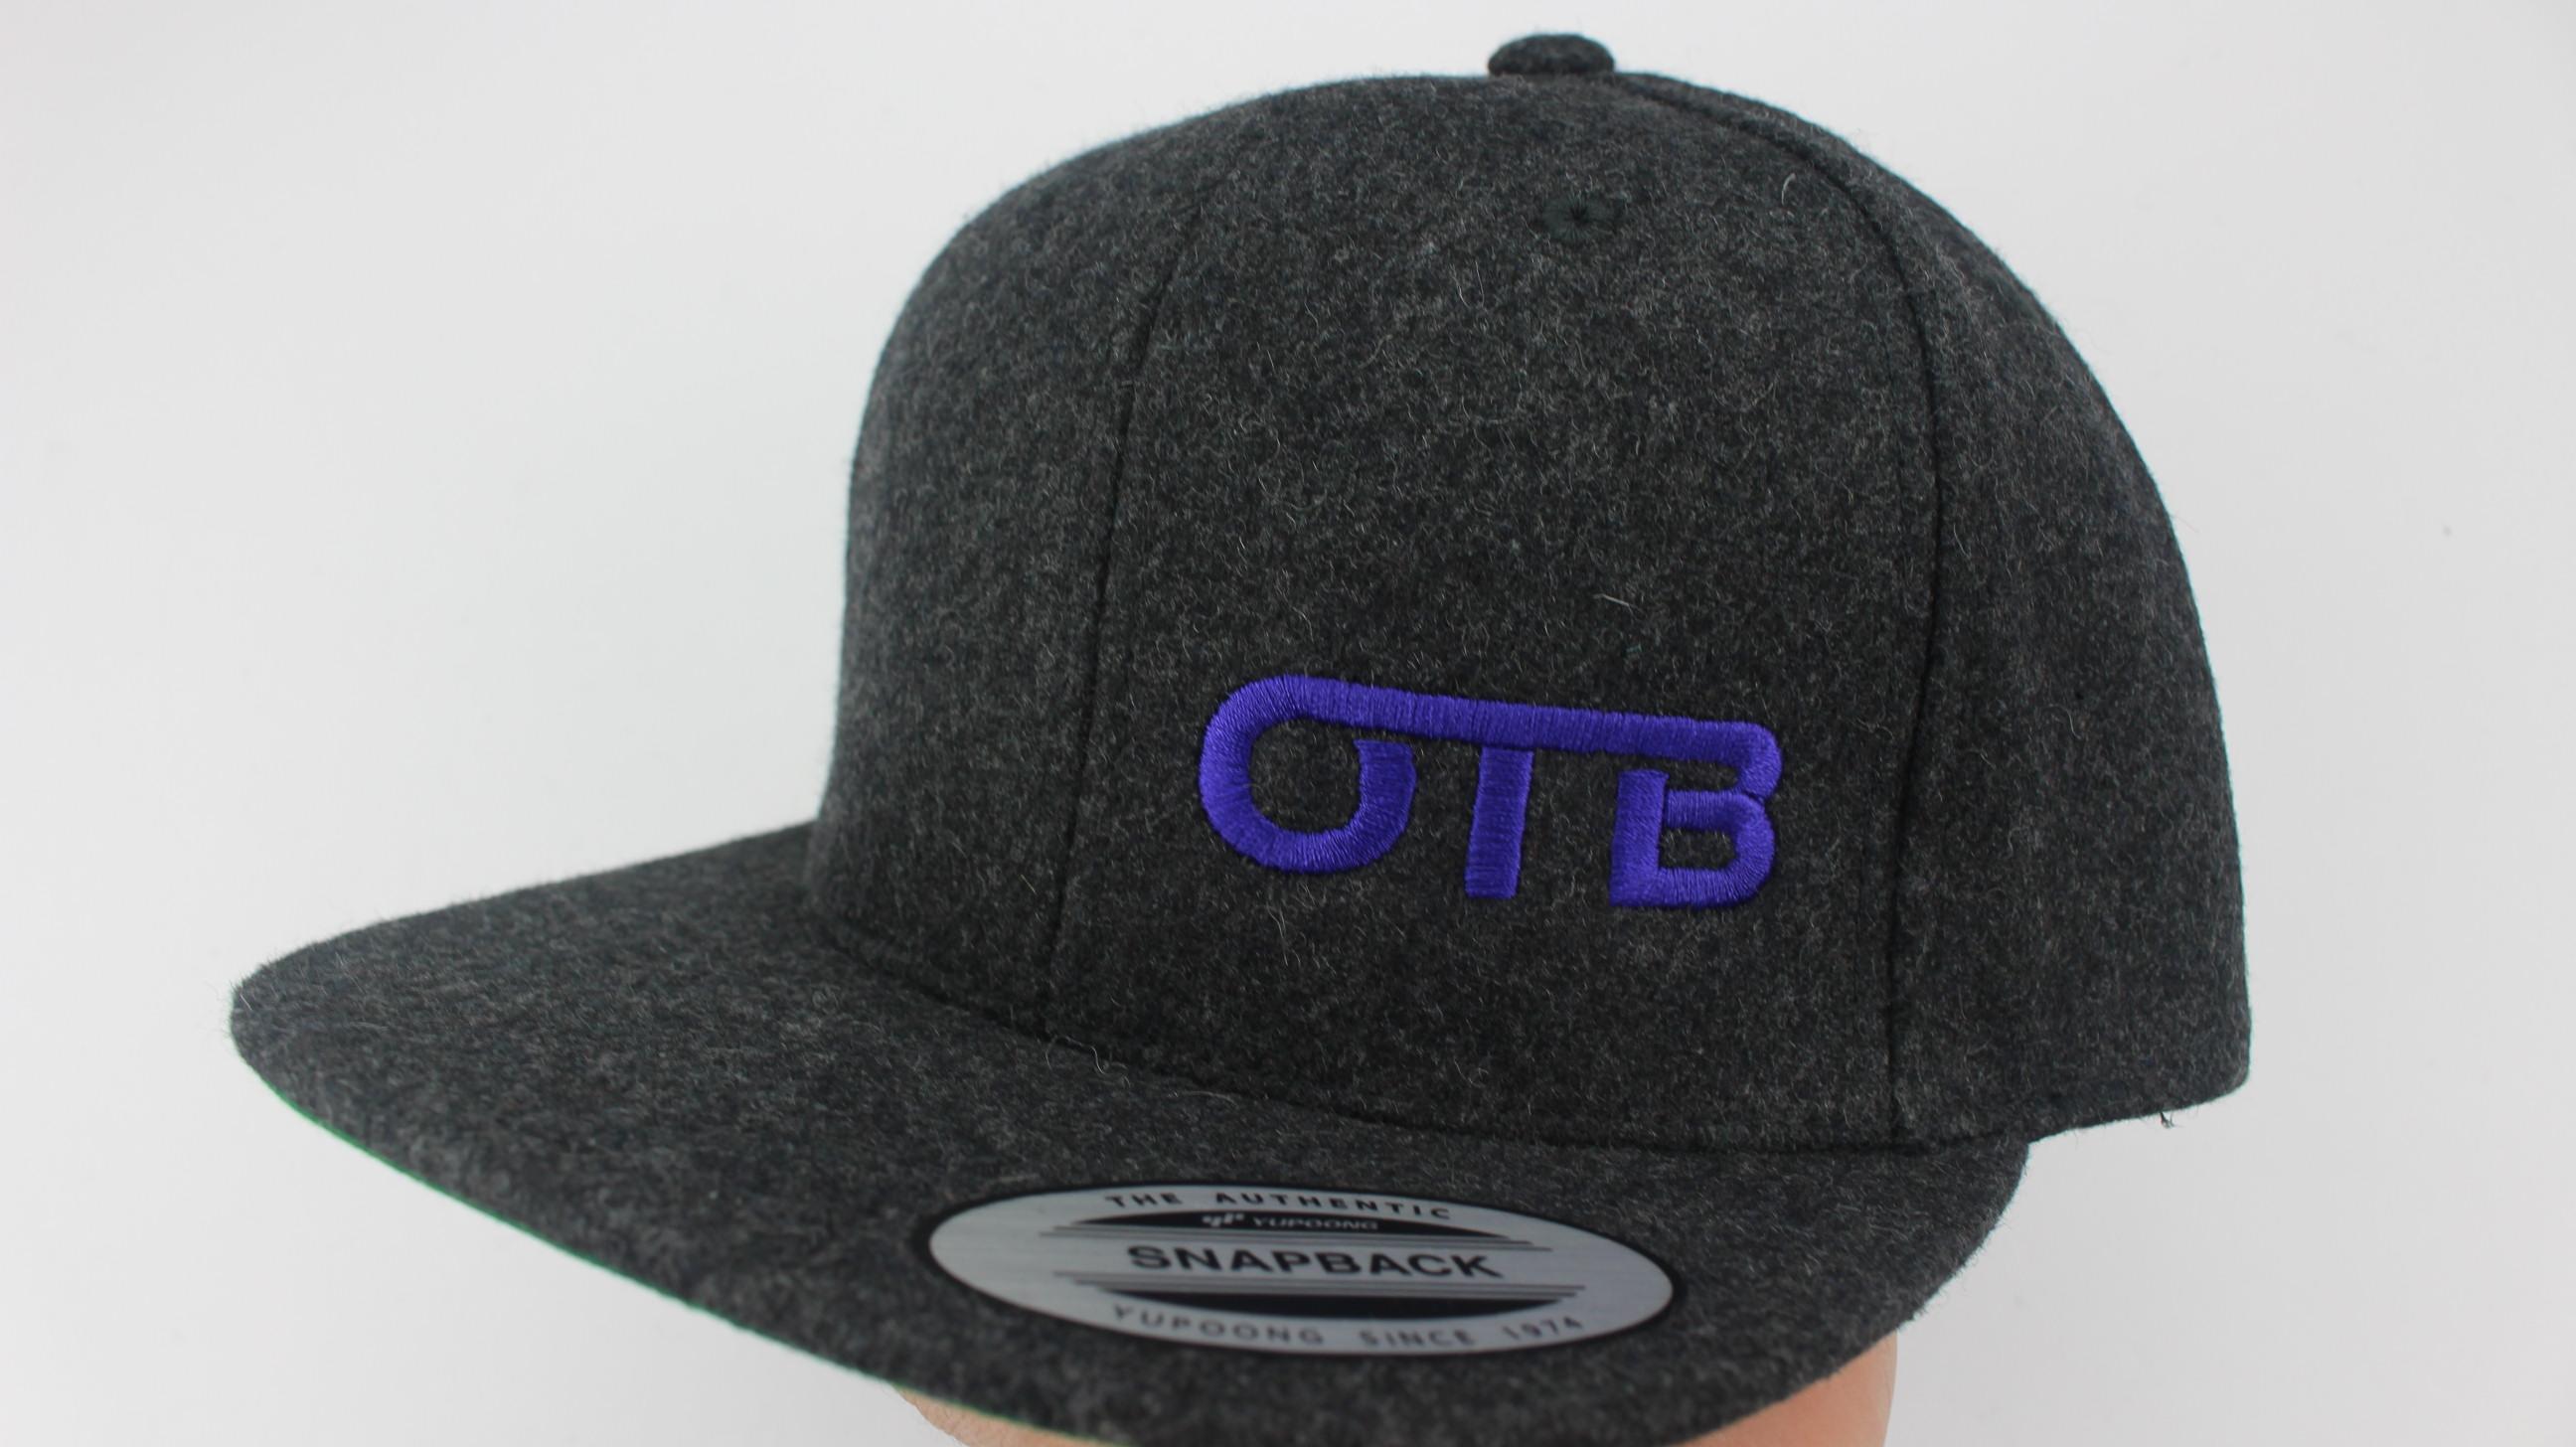 78aabeff749 Flatbill Snapback Hat - dark-heather-wool - 1264 - purple